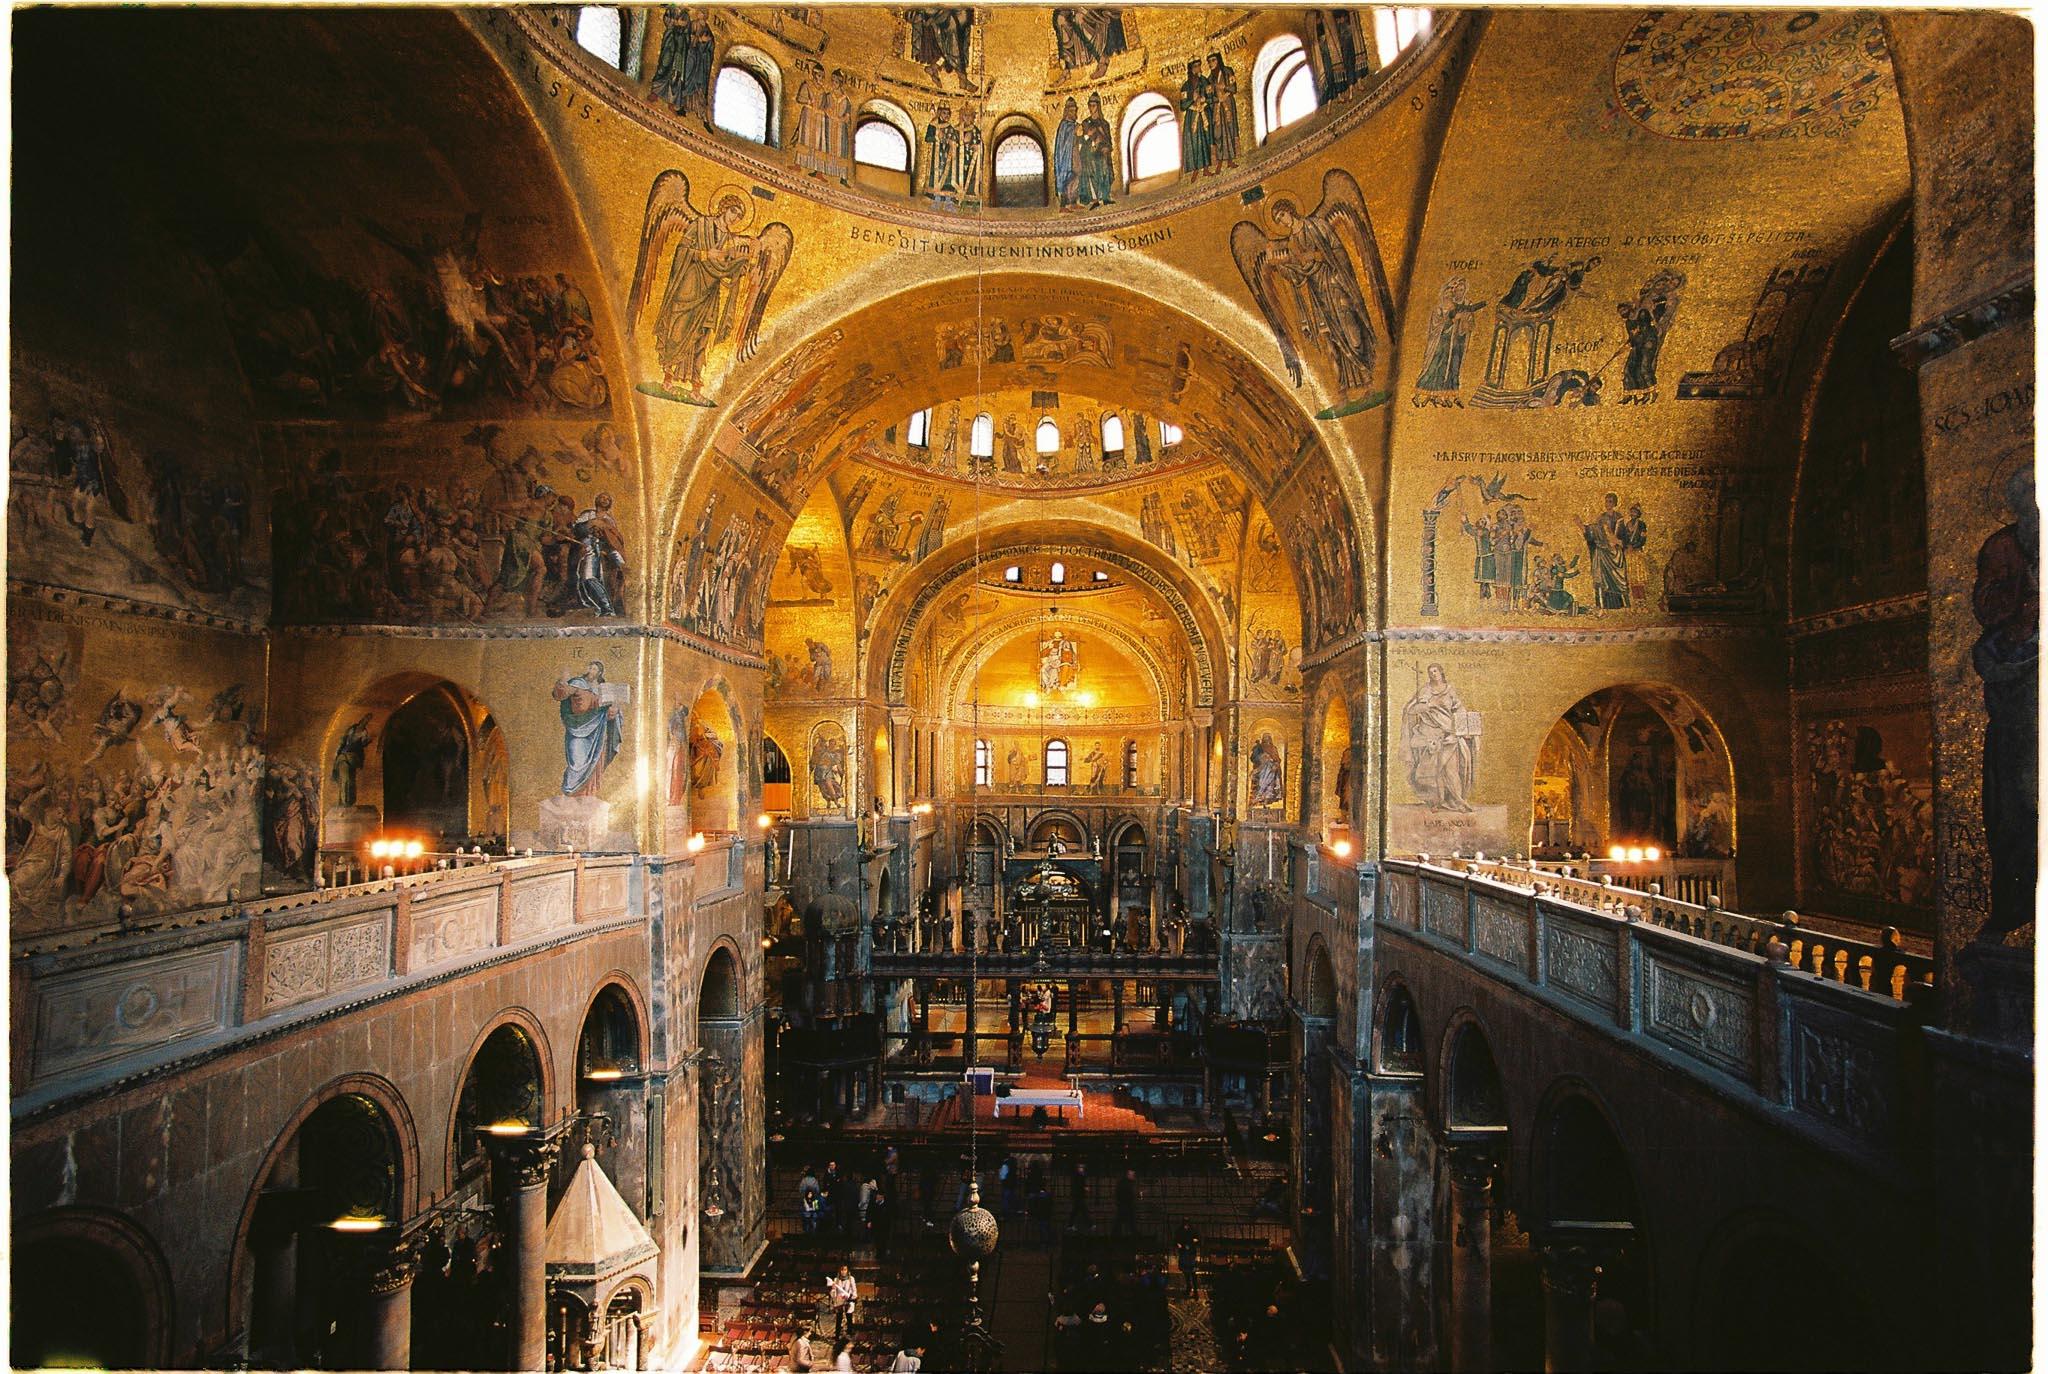 San Marco Basilica nikon F100 kodak ektar